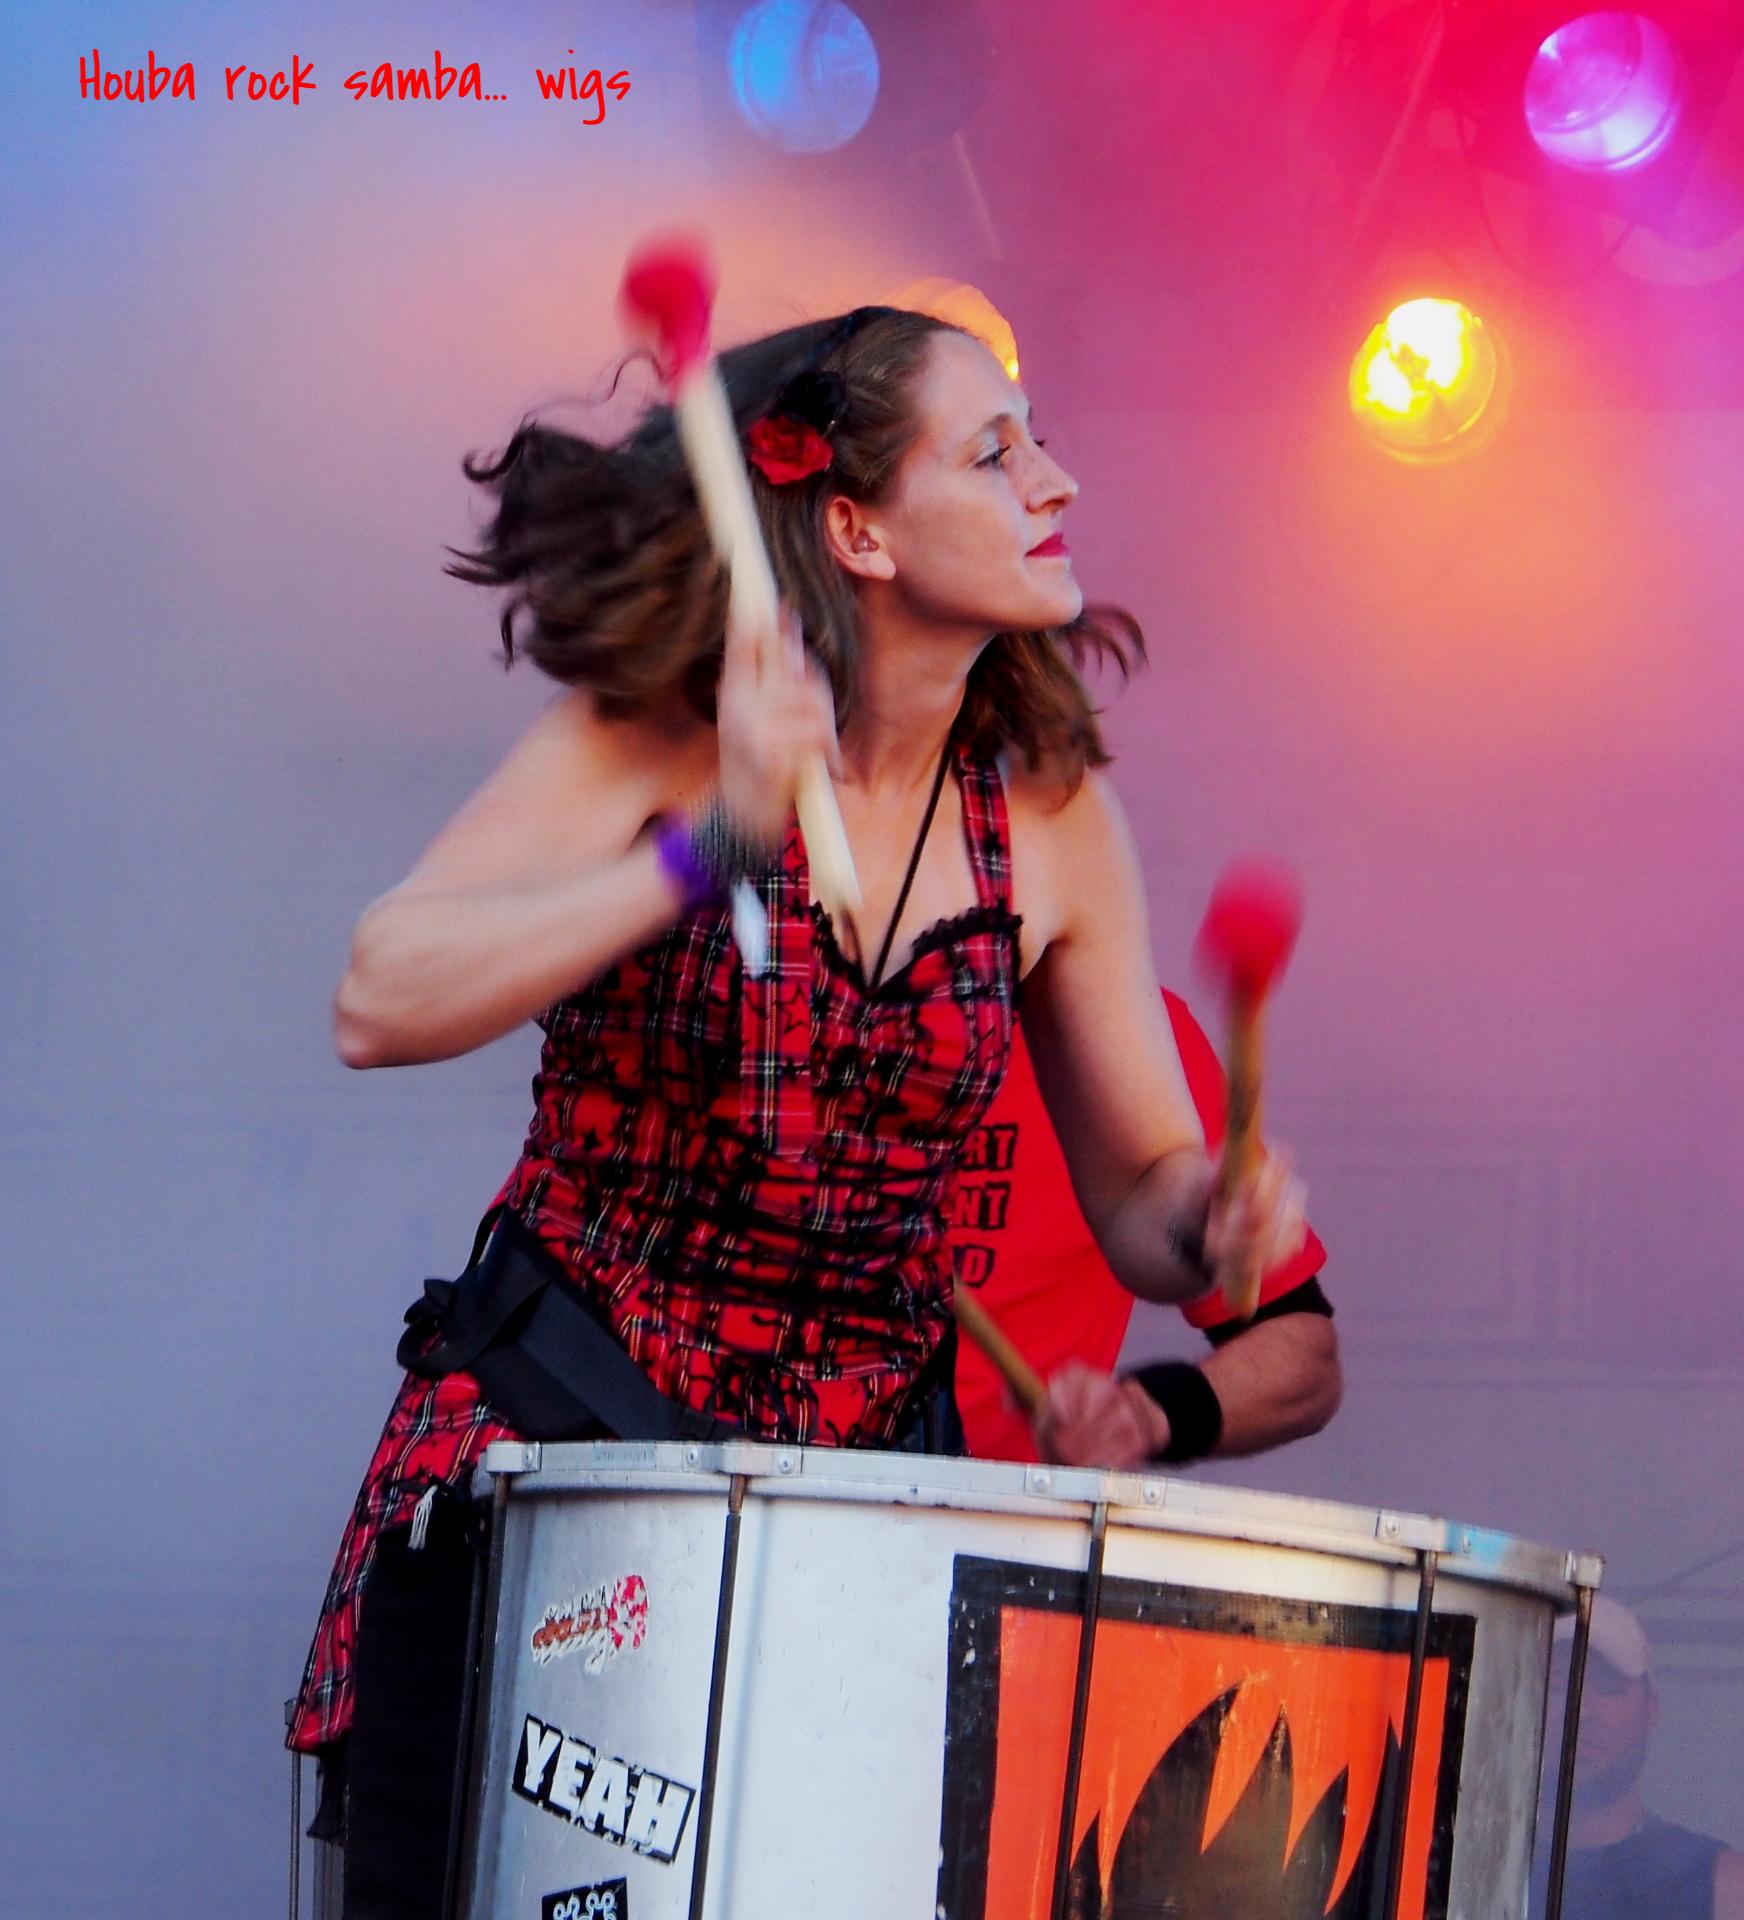 houba rock samba